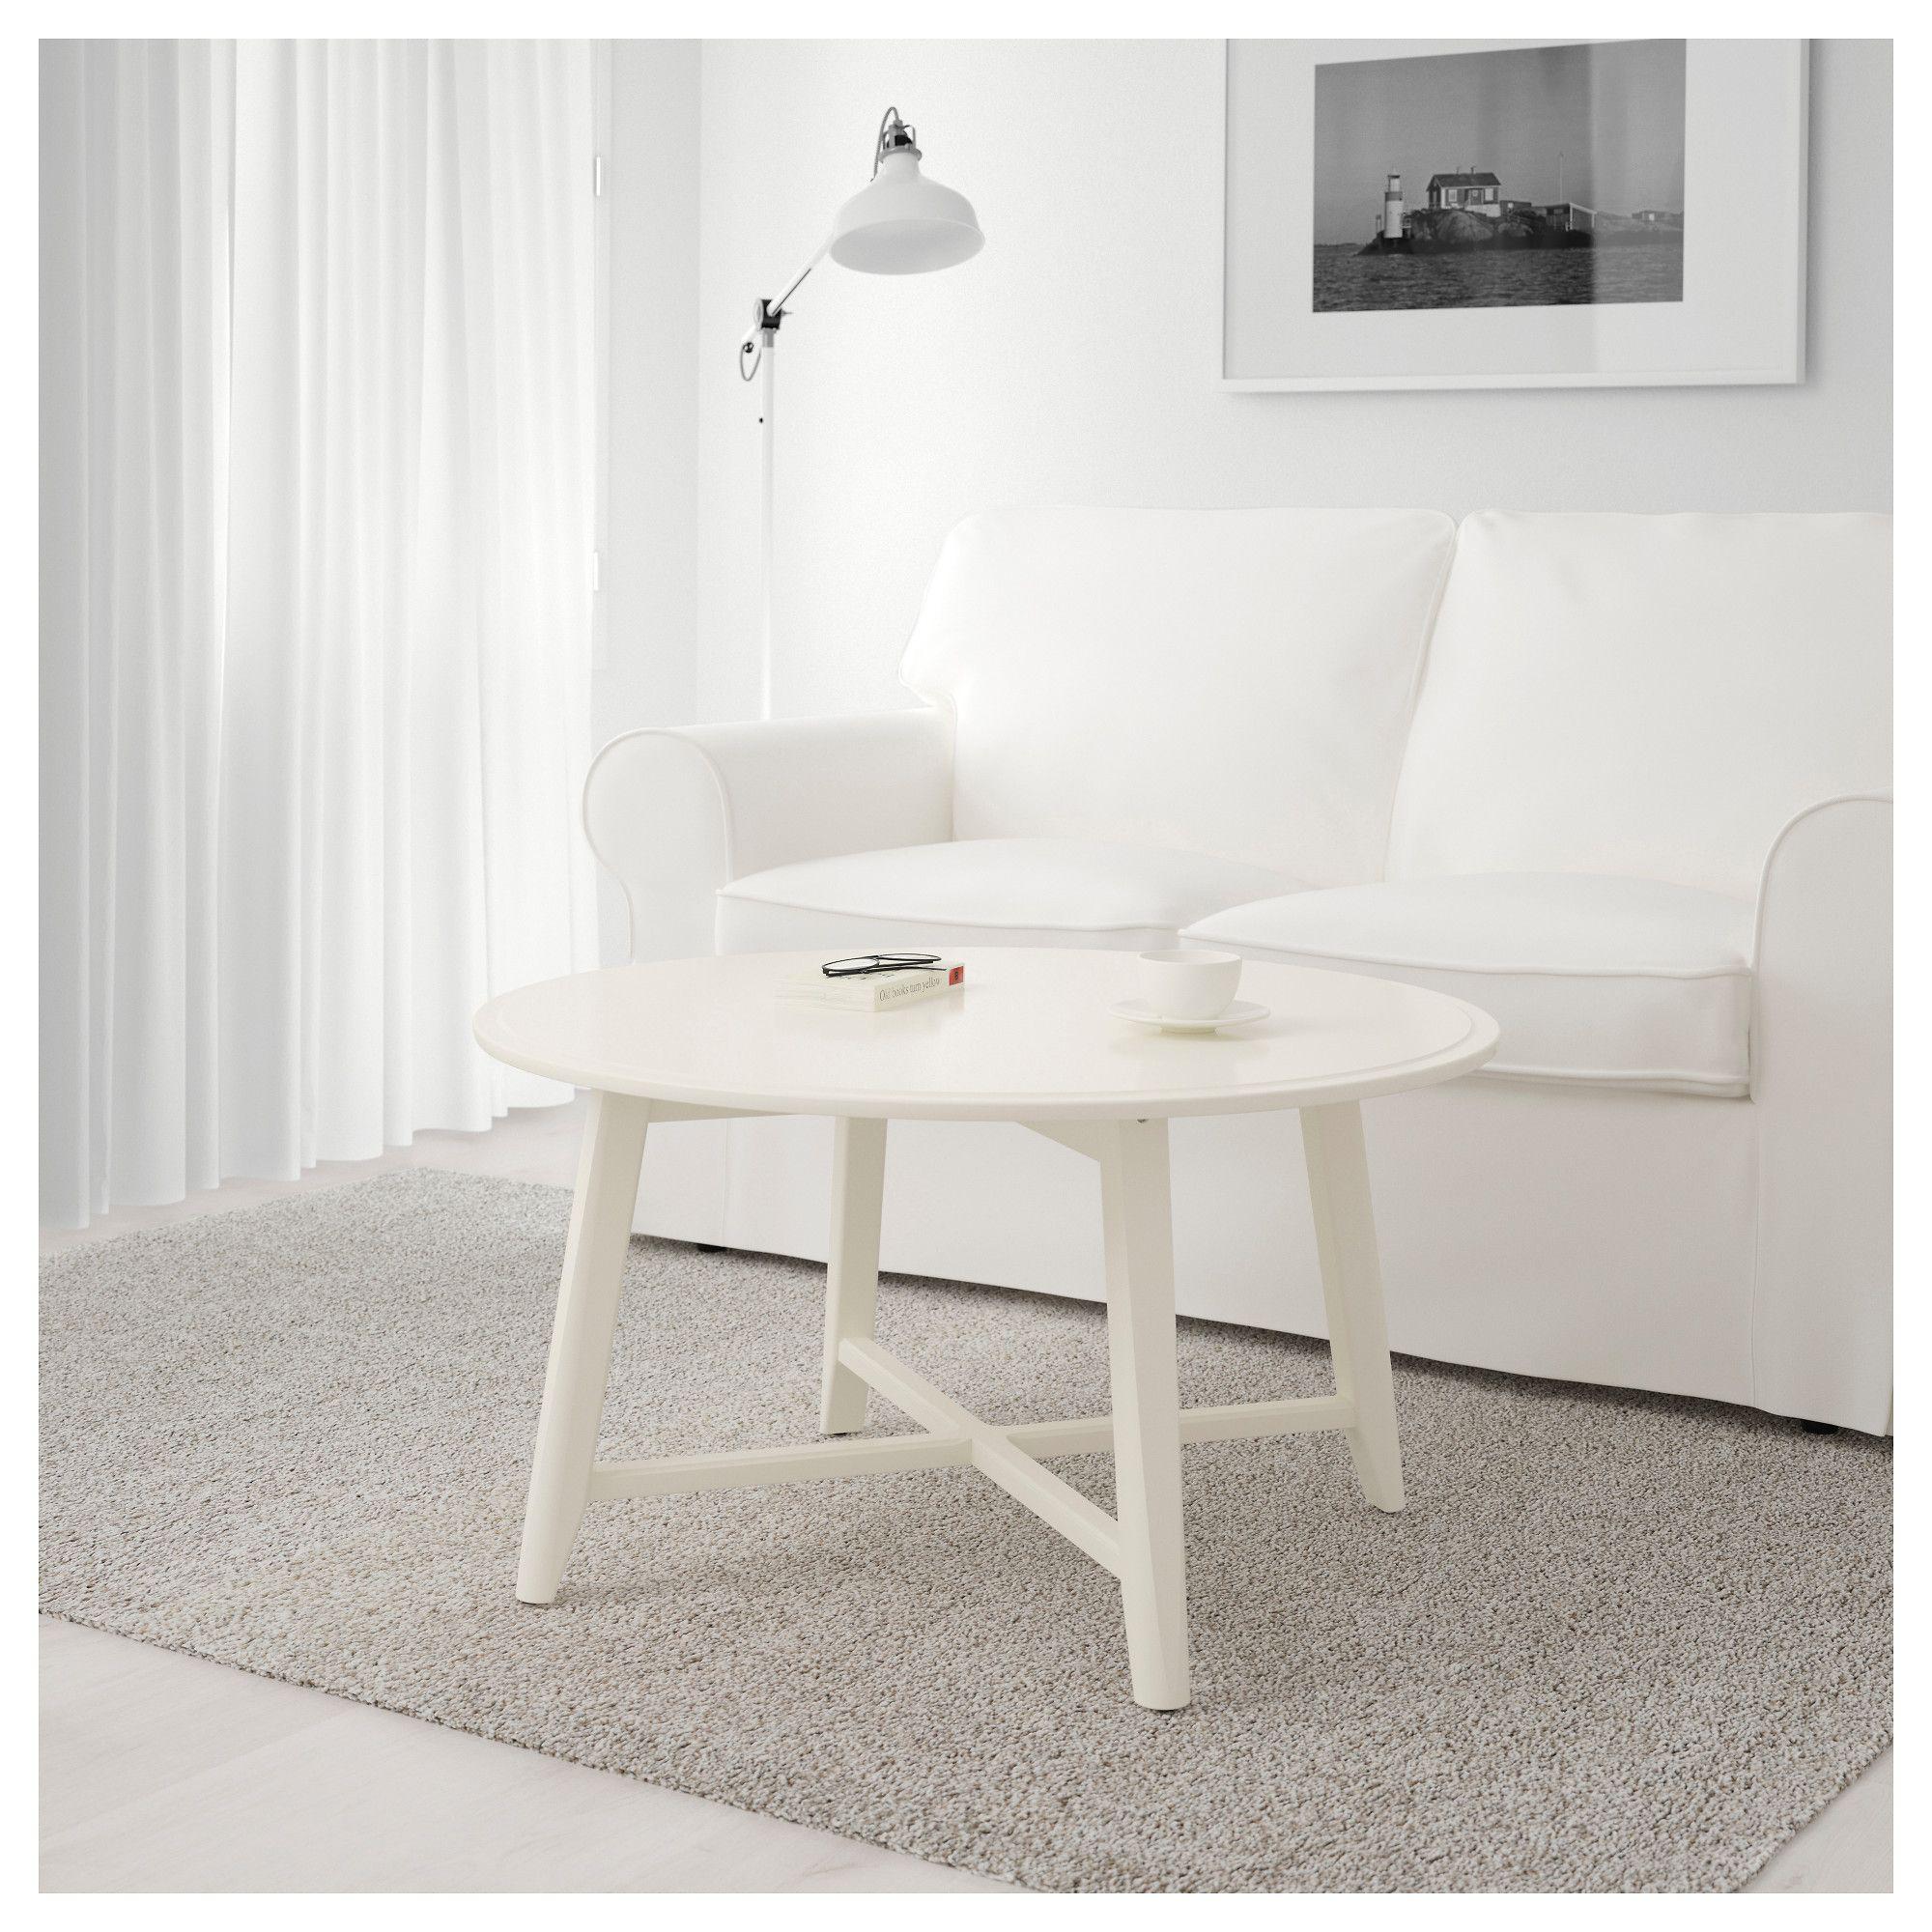 Kragsta White Coffee Table 90 Cm Ikea Coffee Table White Round Coffee Table Ikea Coffee Table